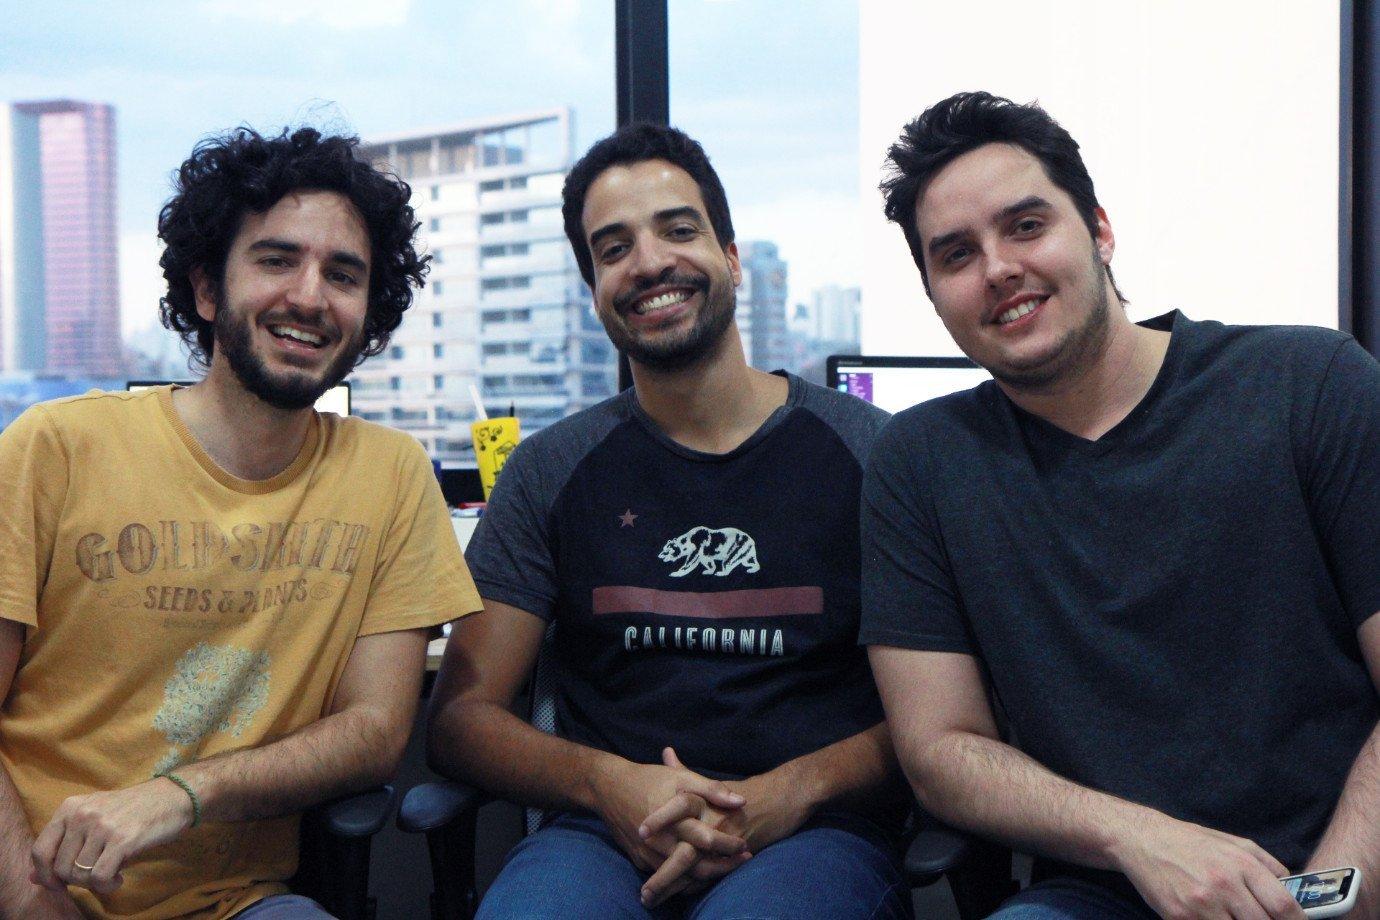 Gustavo Gracitelli (CEO), Leonardo Liborio (COO) e Abraão Lacerda (CTO), do Bynd